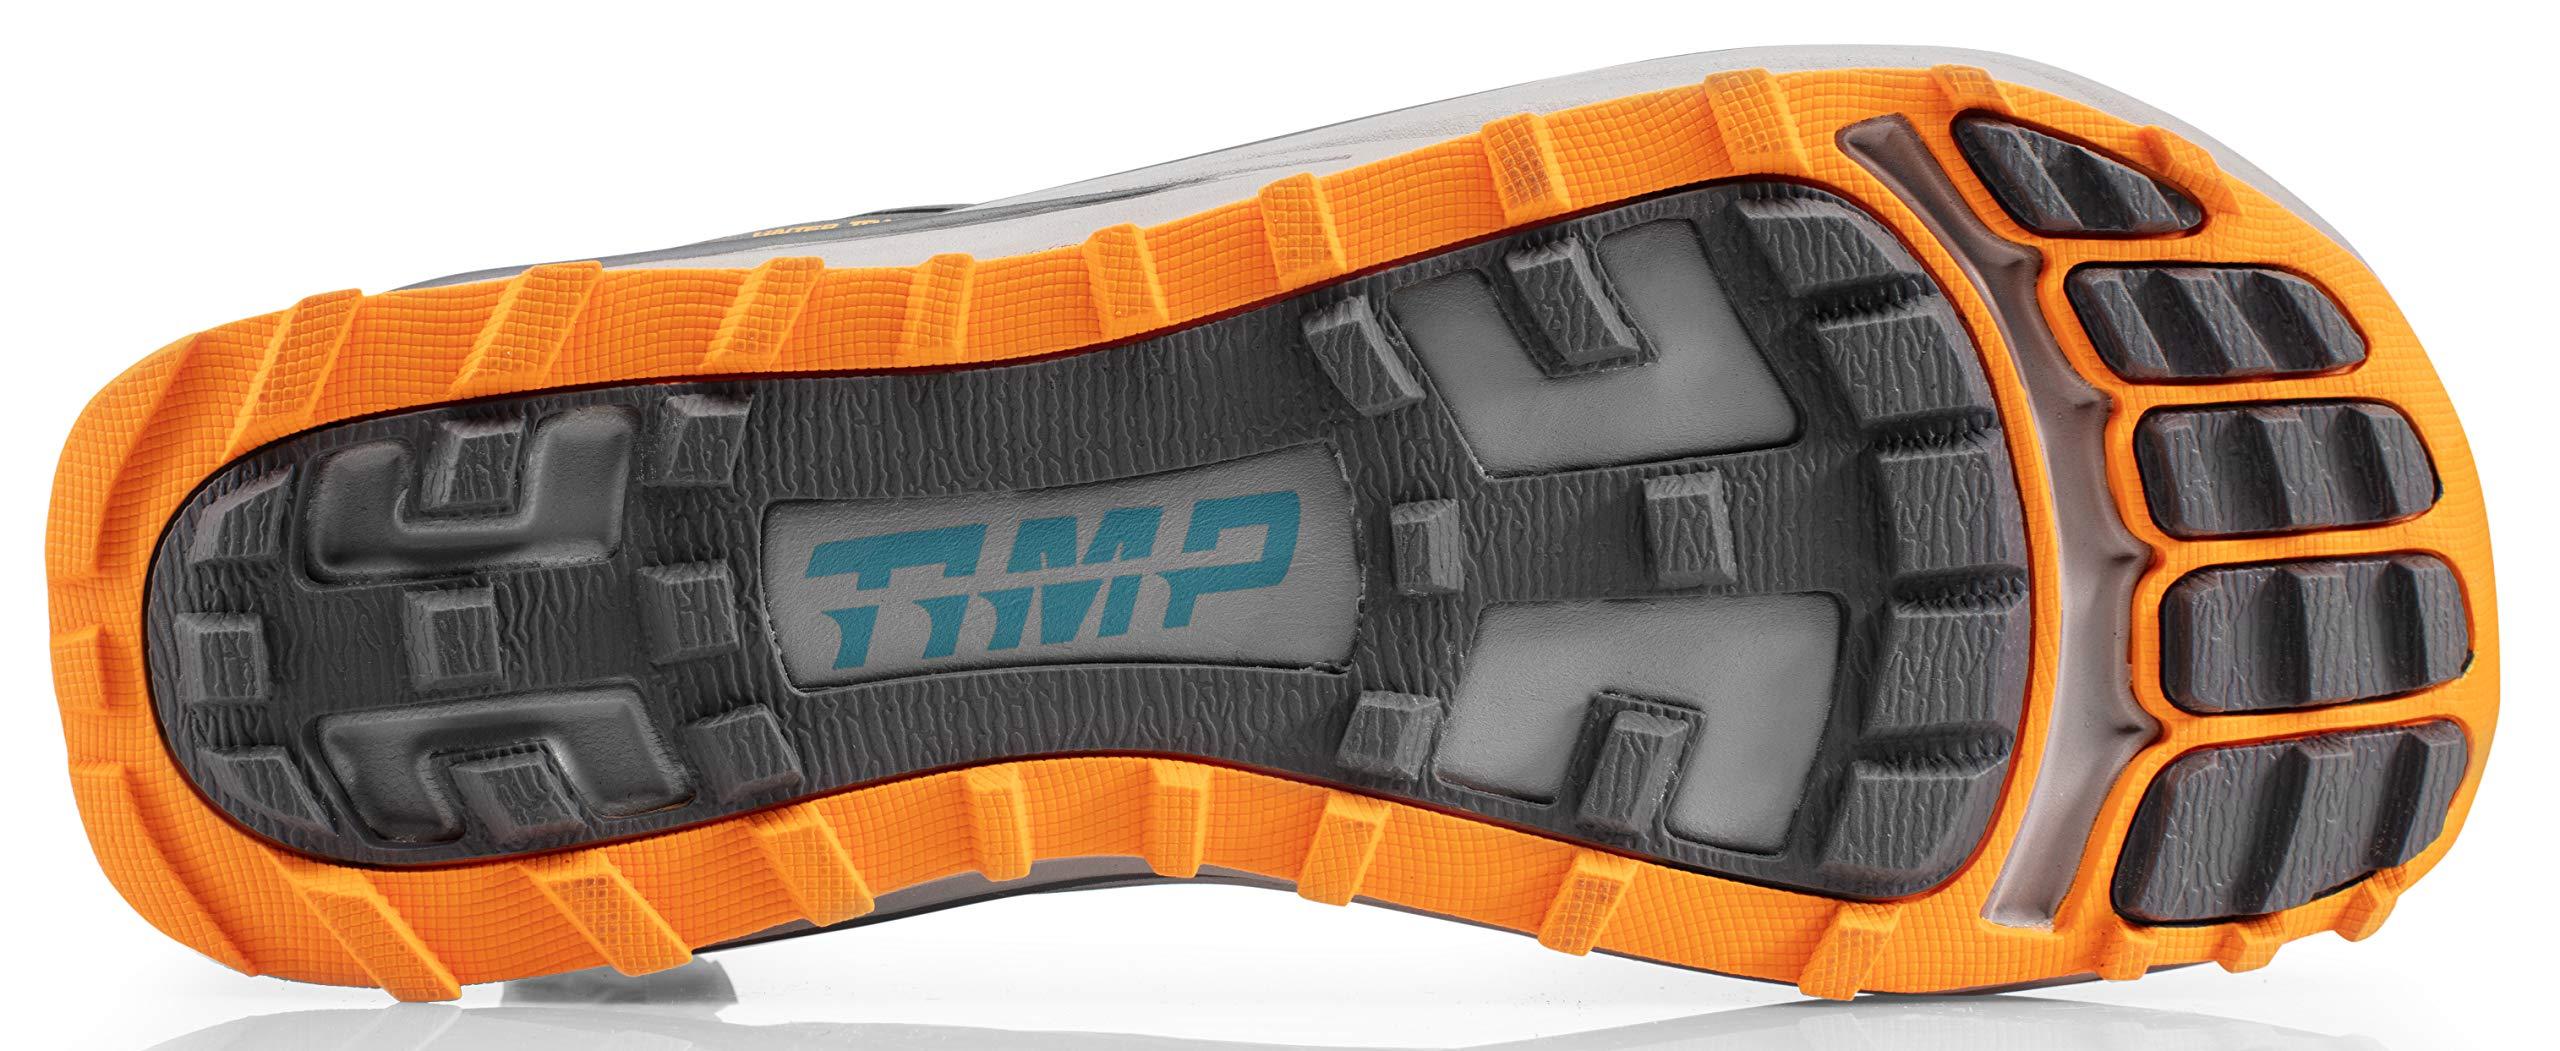 Altra AFM1957F Men's TIMP 1.5 Trail Running Shoe, Gray/Orange - 8.5 D(M) US by Altra (Image #3)